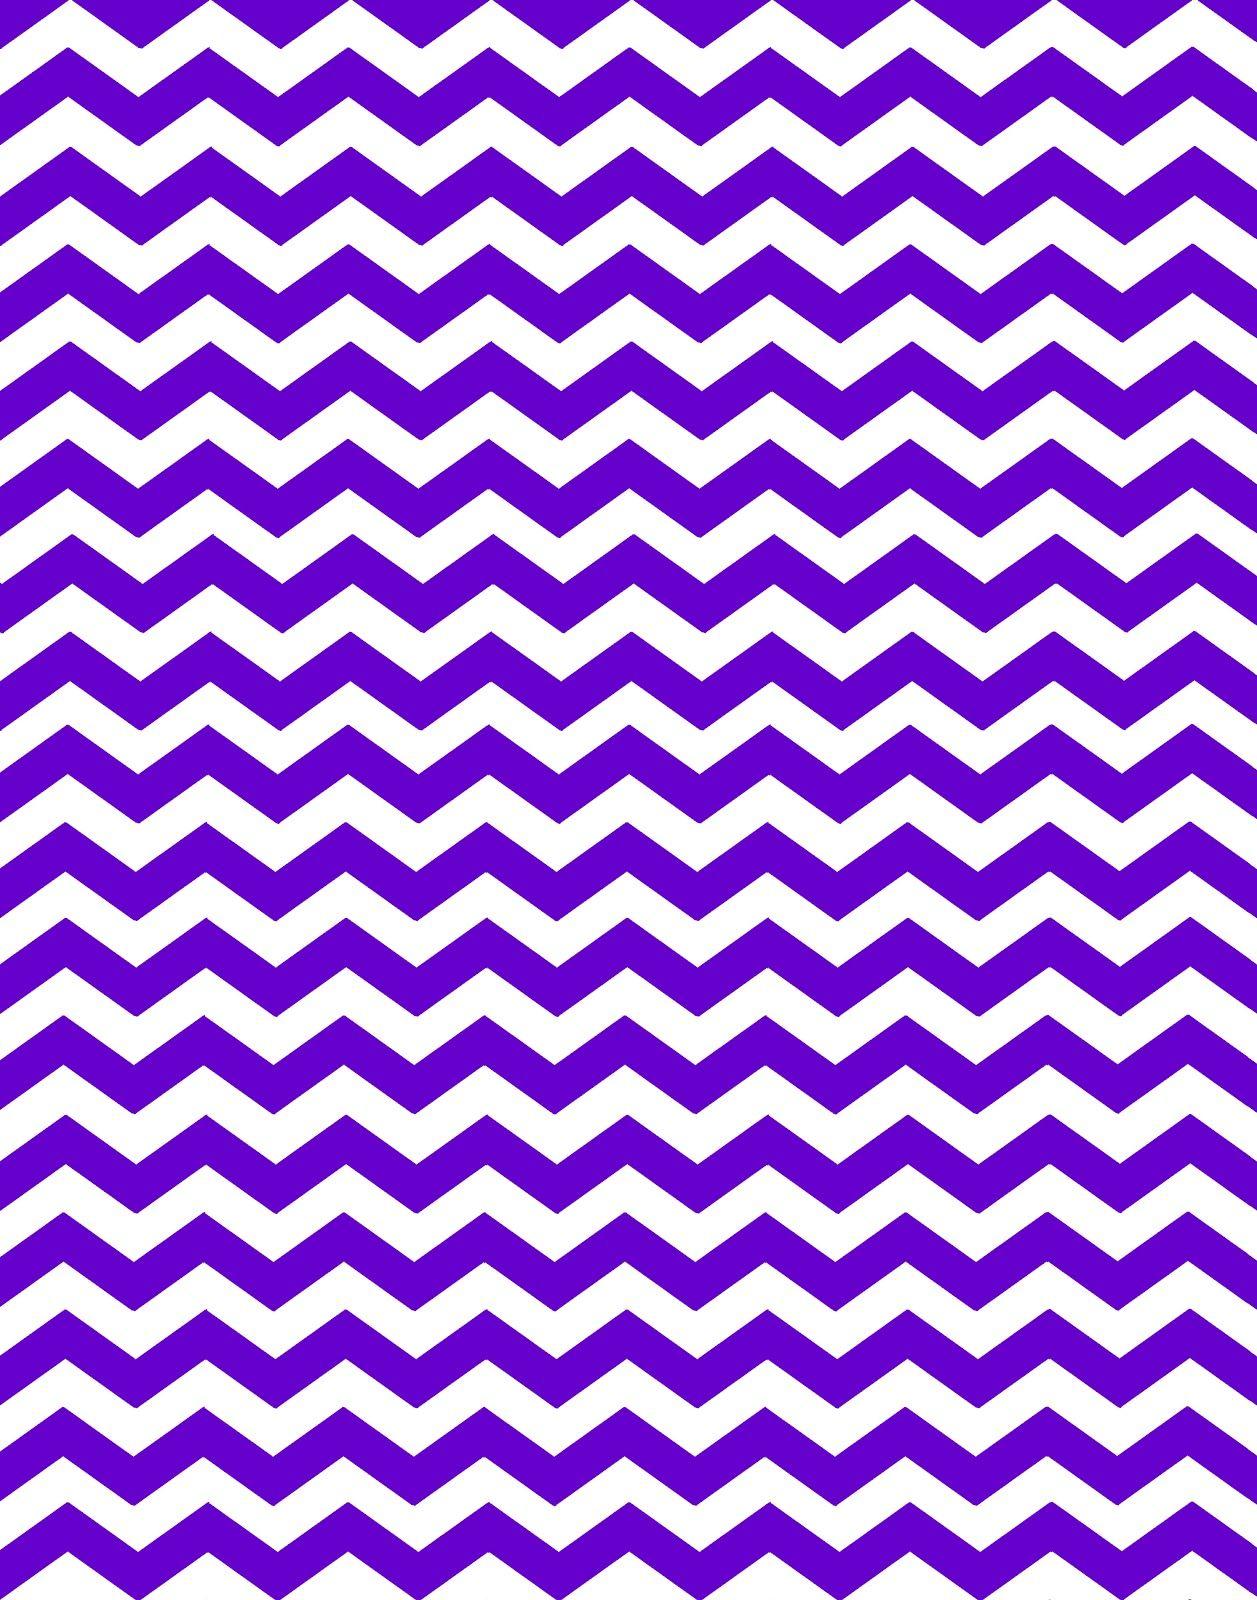 Chevron Purple Lilac Lavendar Violet Jpg 1 257 215 1 600